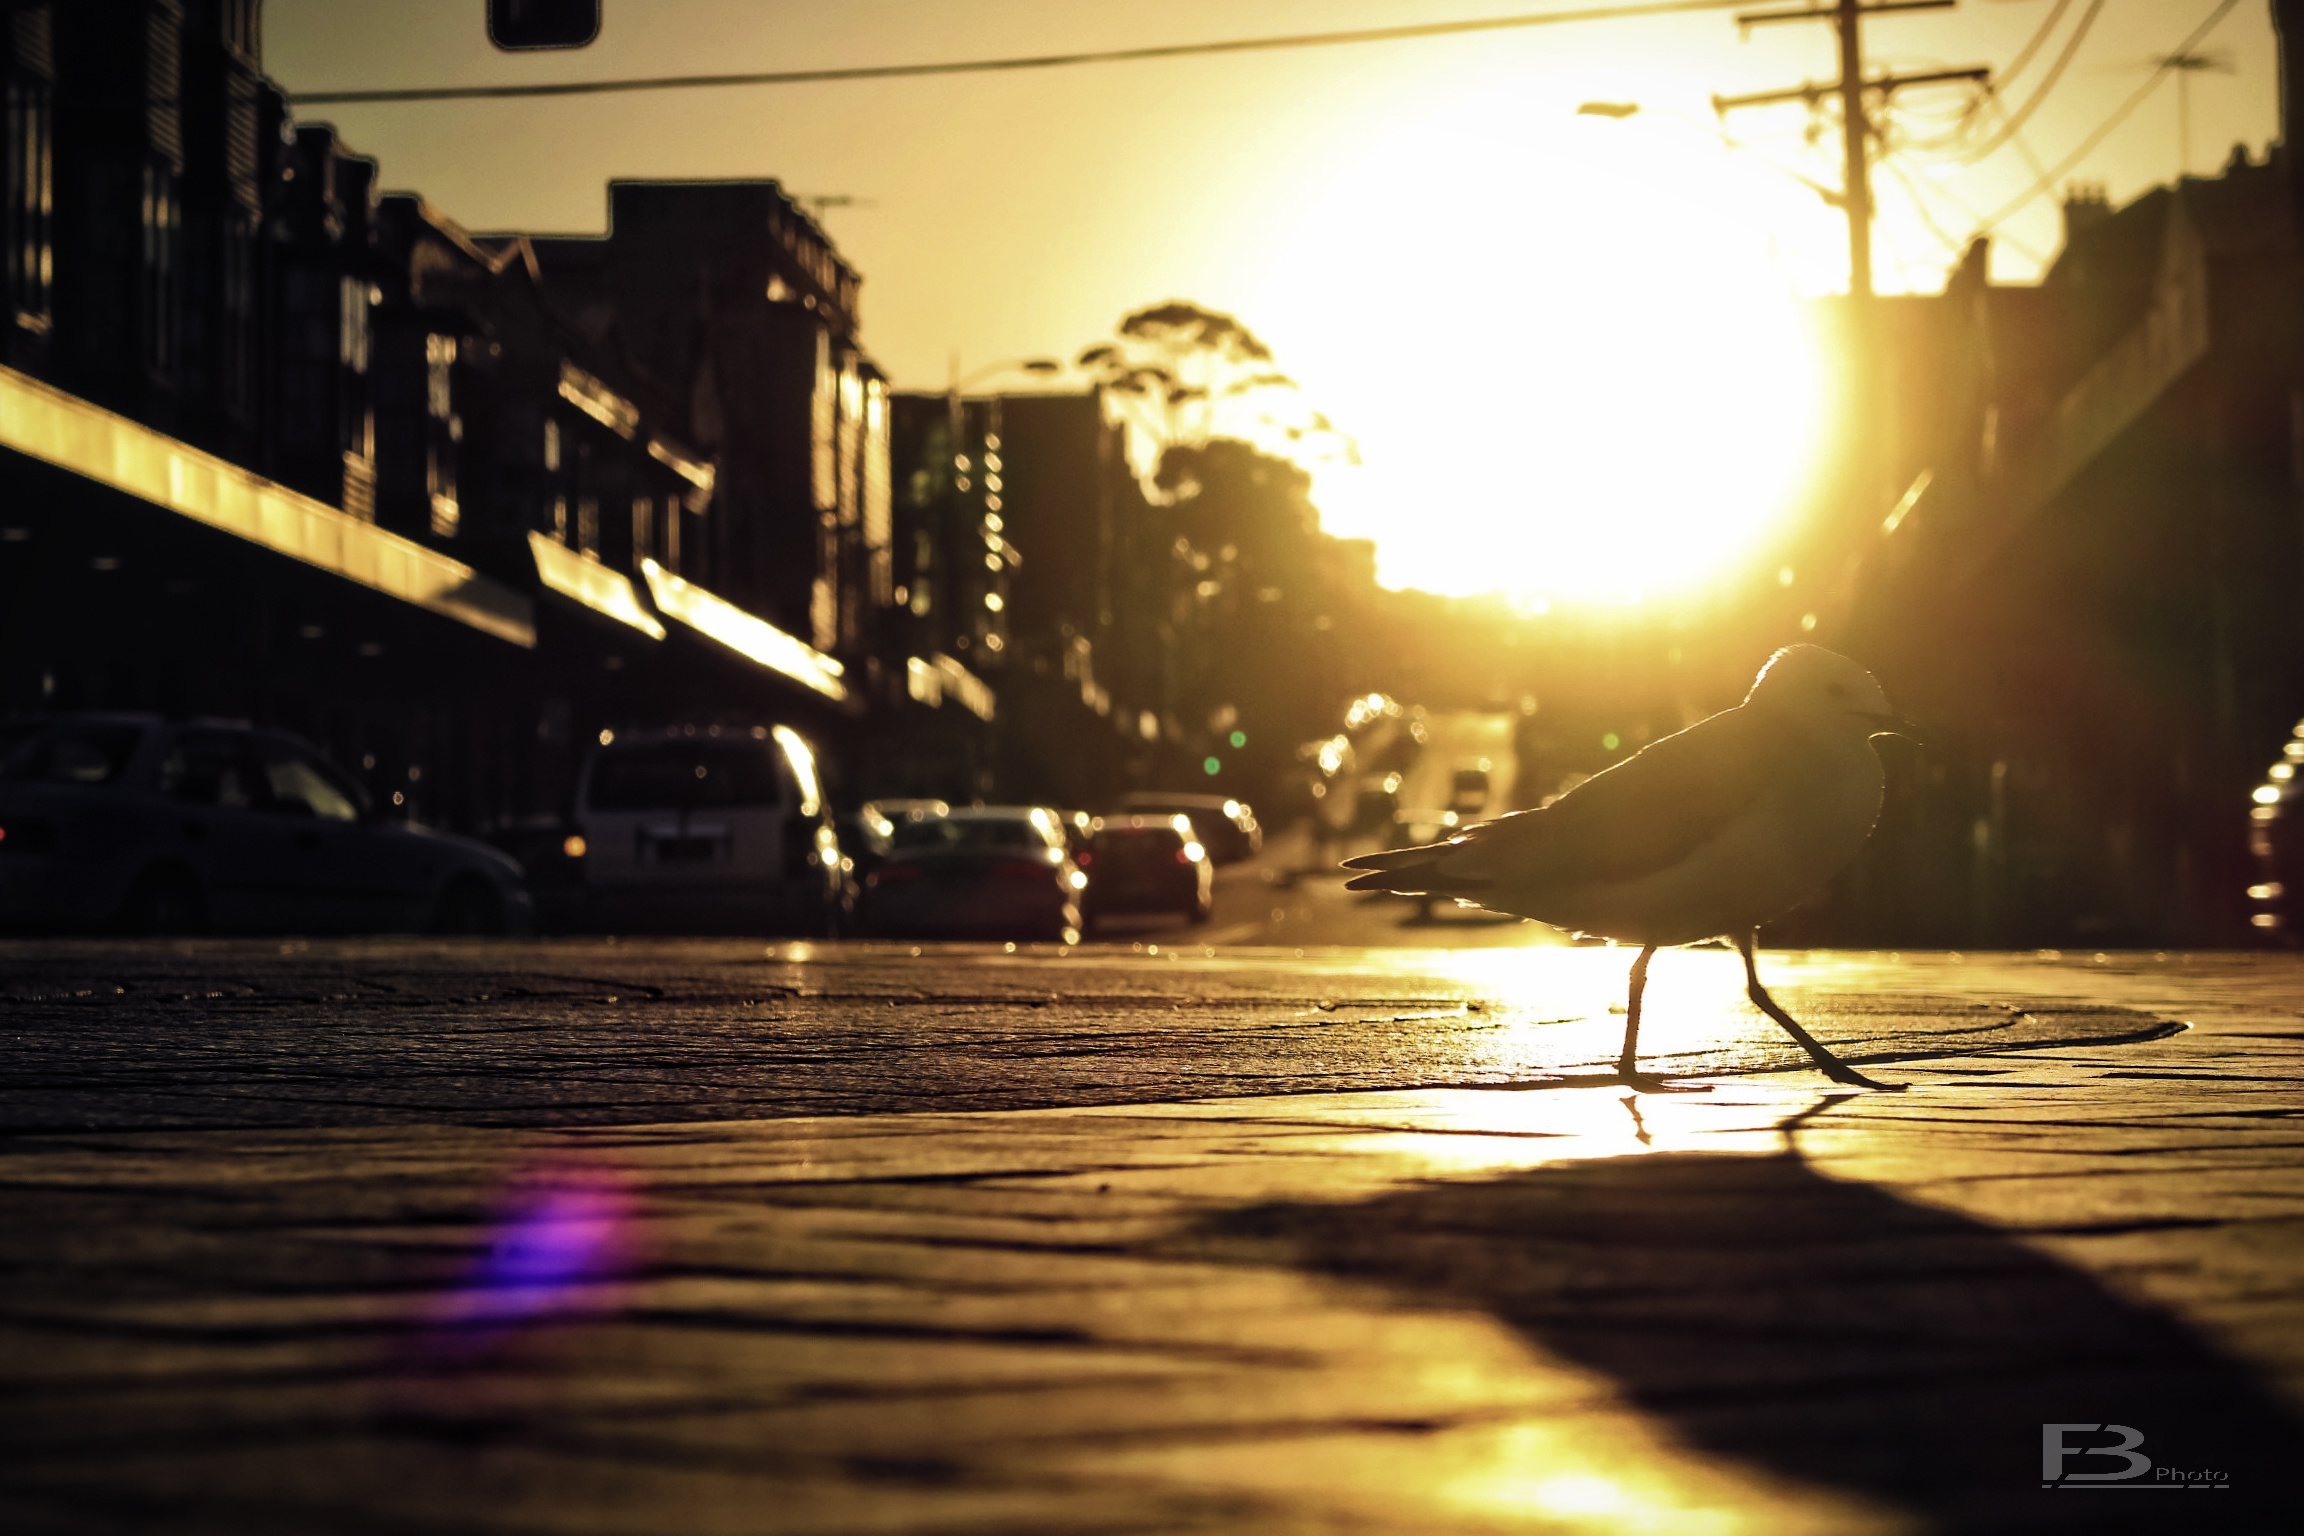 Sydney_2017_B012_27.jpg